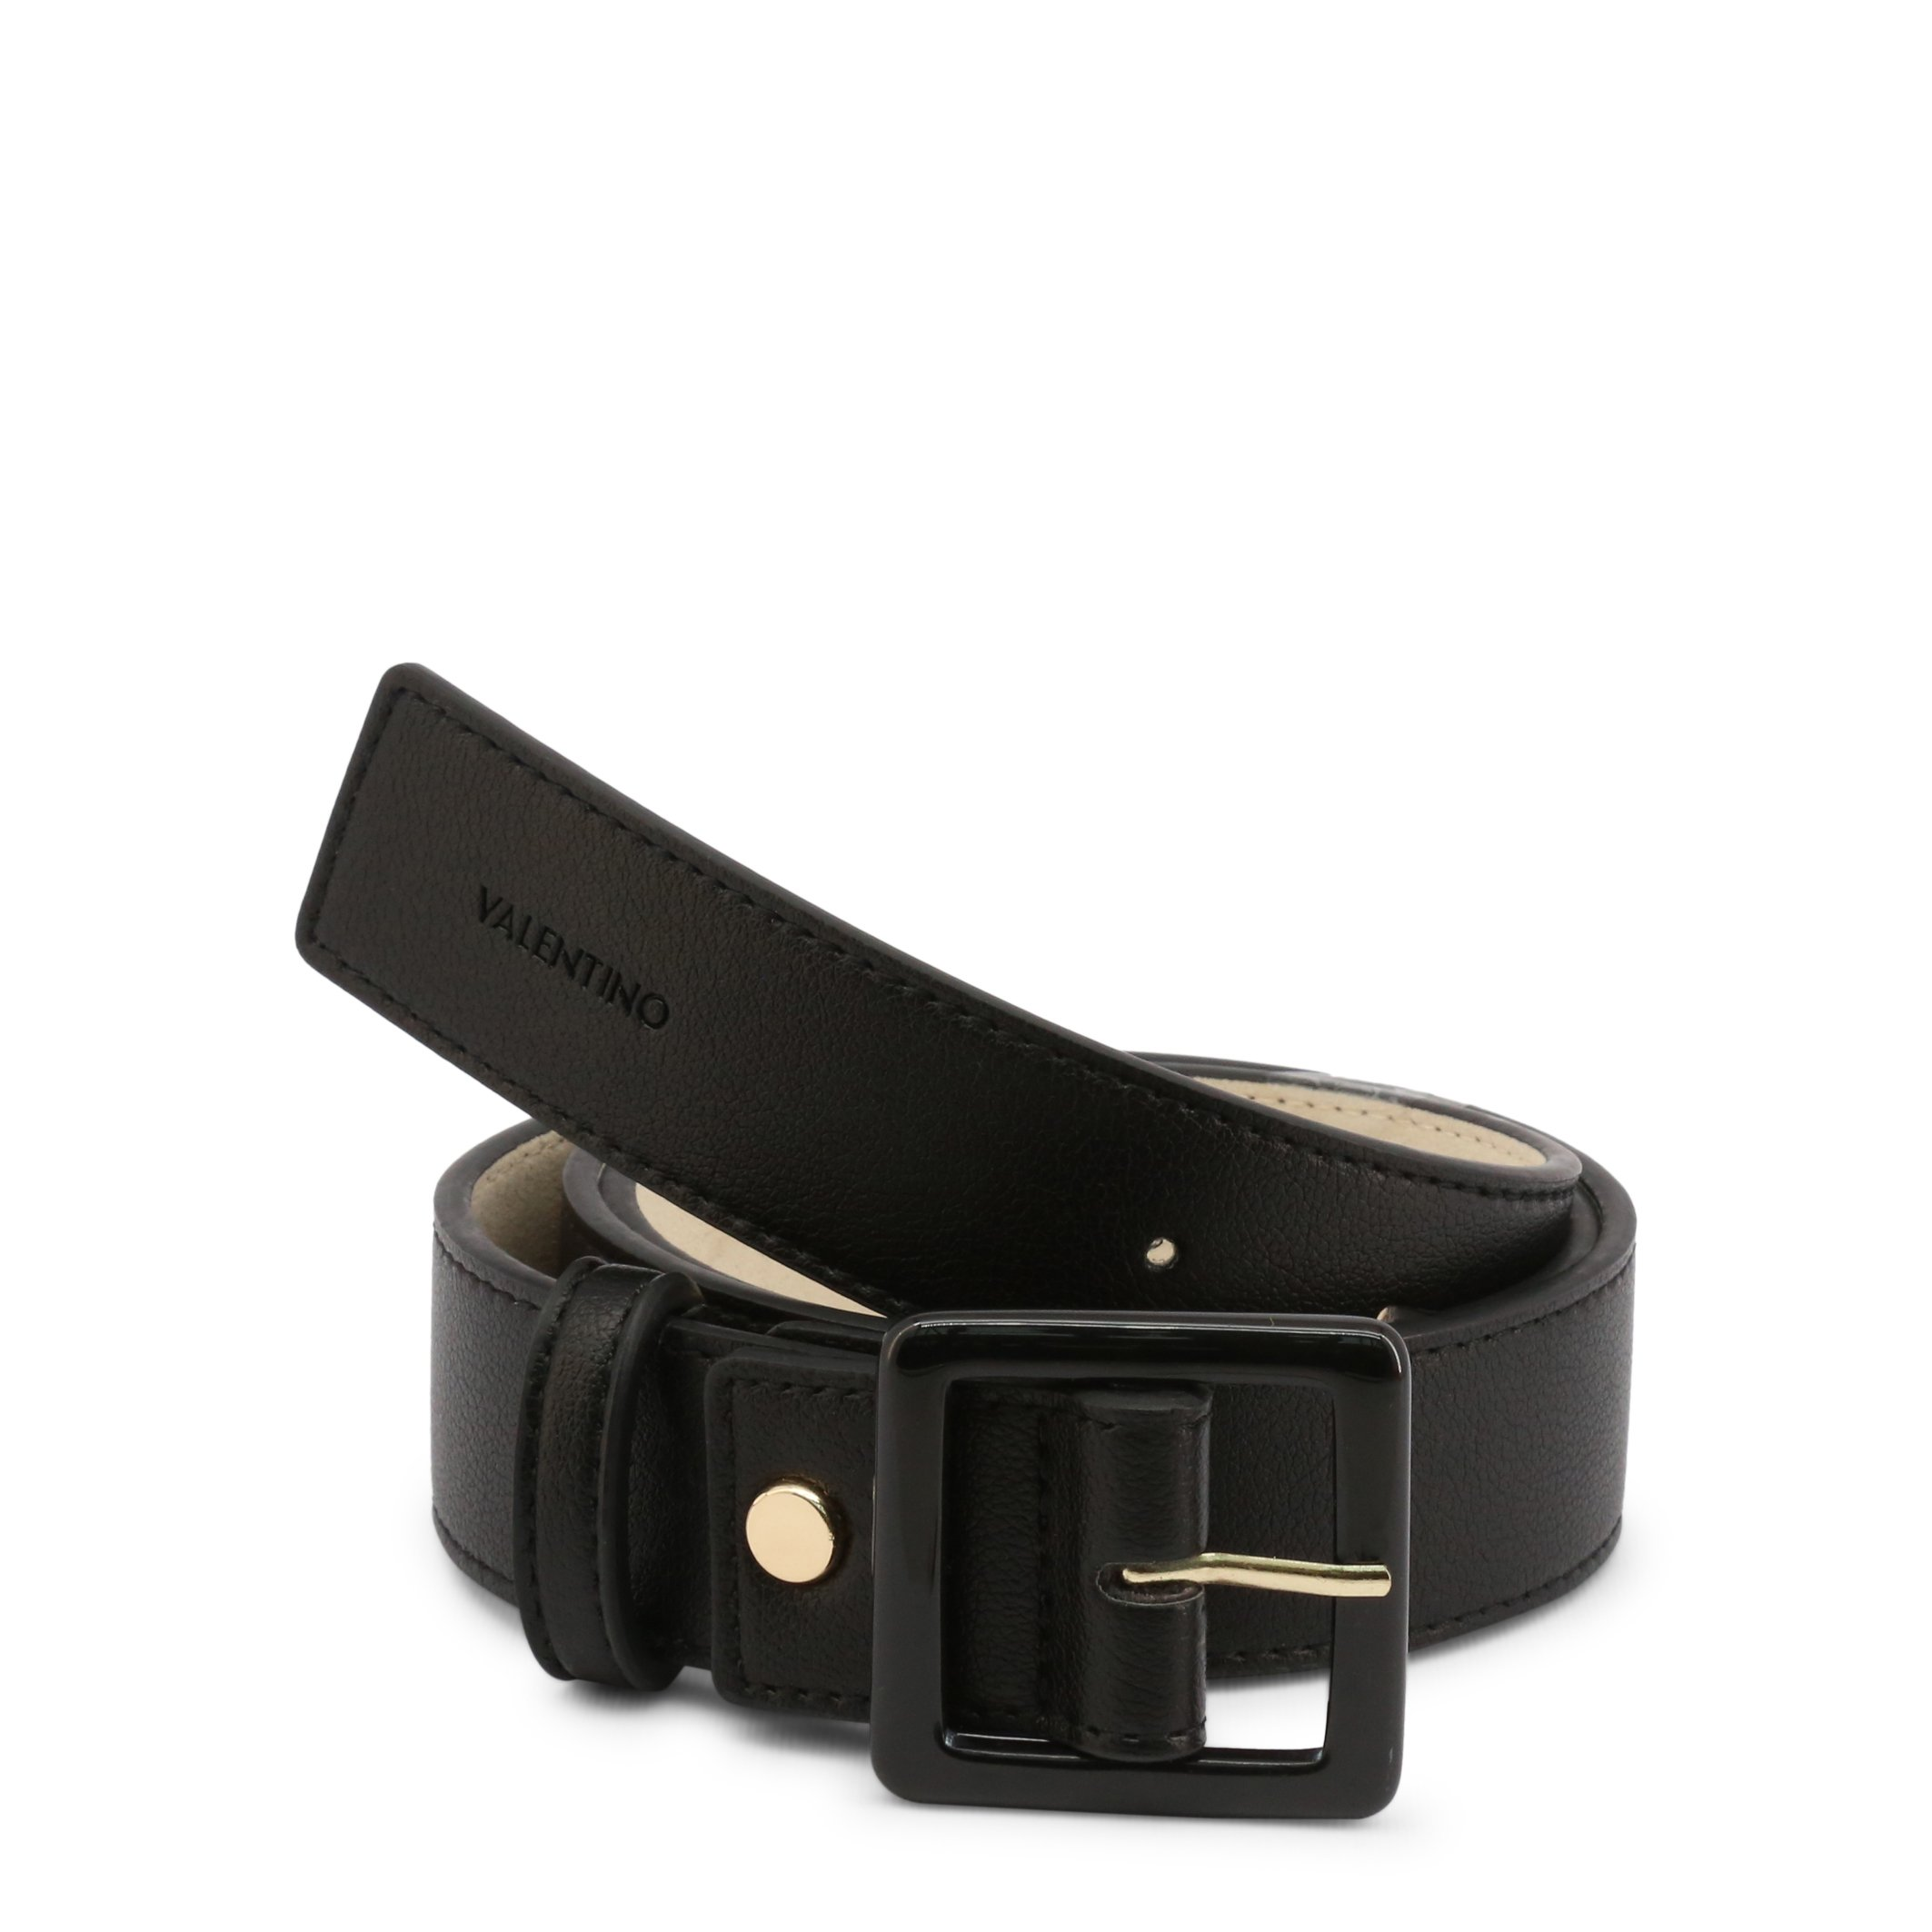 Valentino by Mario Valentino Women's Belt Various Colours ANGELO-VCS3XH57 - black S